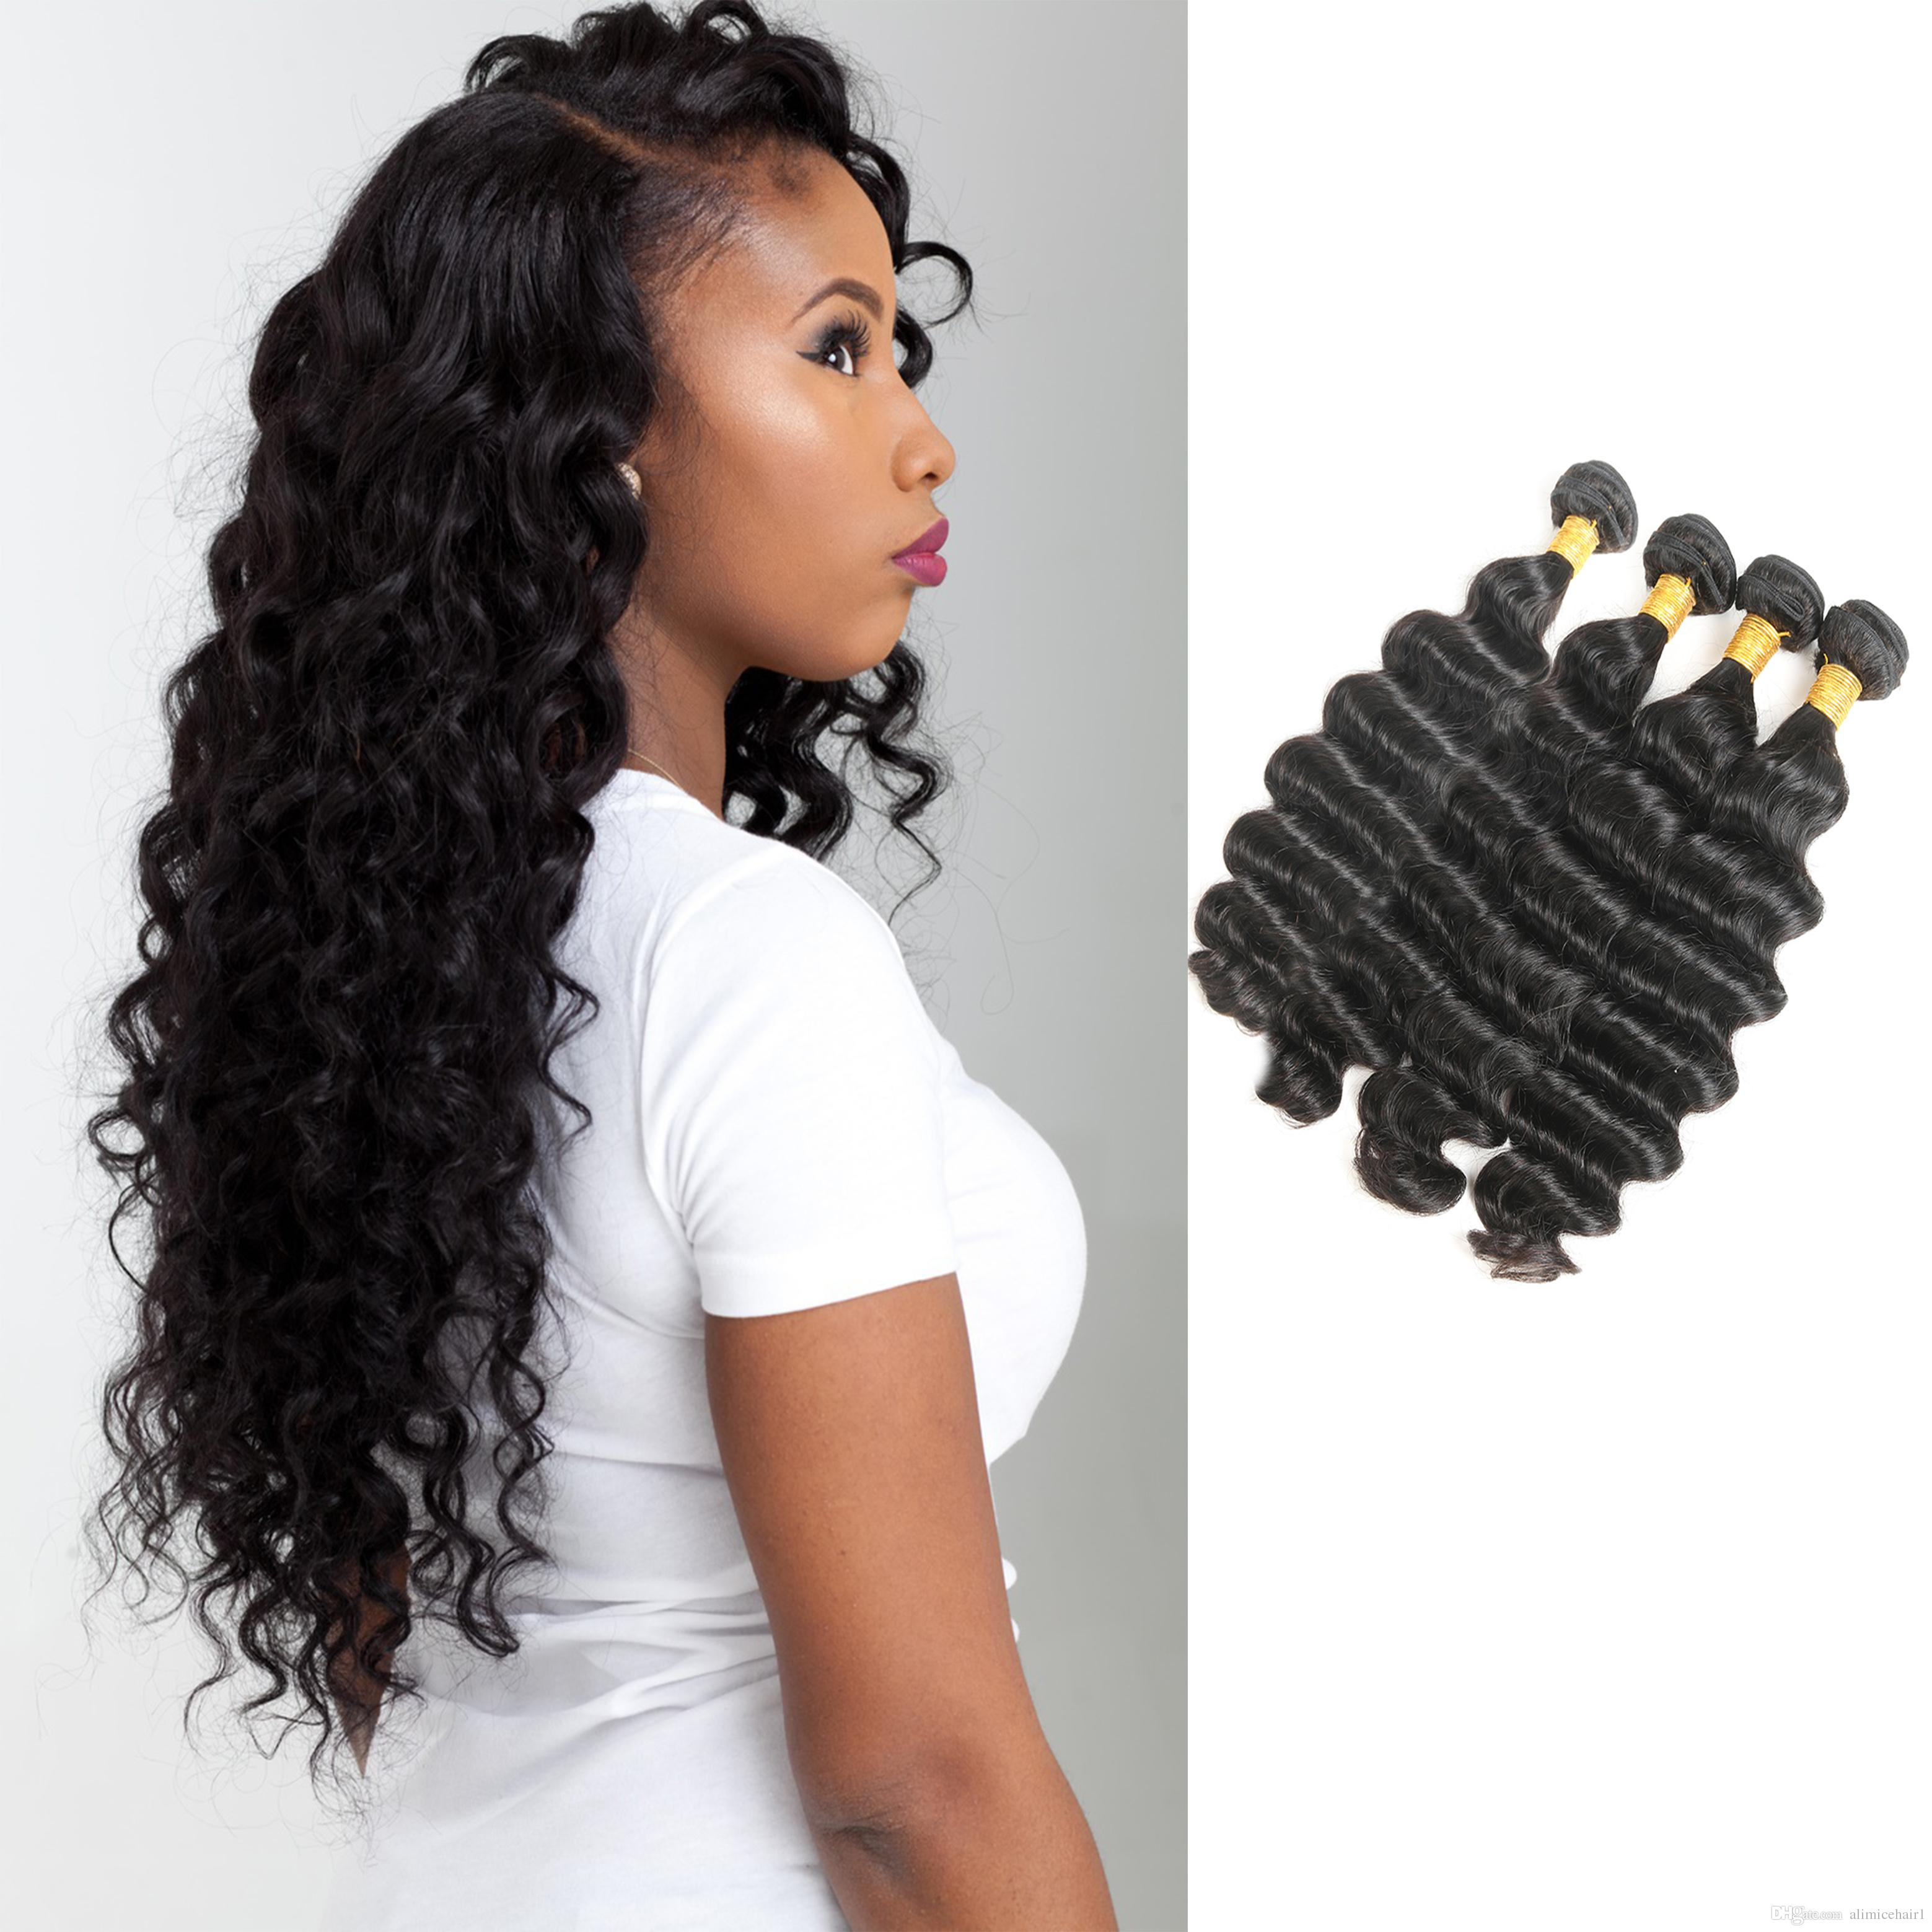 Human Hair Weaves Peruvian Loose Deep Hair Weaves 3 Bundle With Closure Natural Color Loose Curly Ocean Wave Human Hair Free Middle 3 Part Closure Fine Craftsmanship